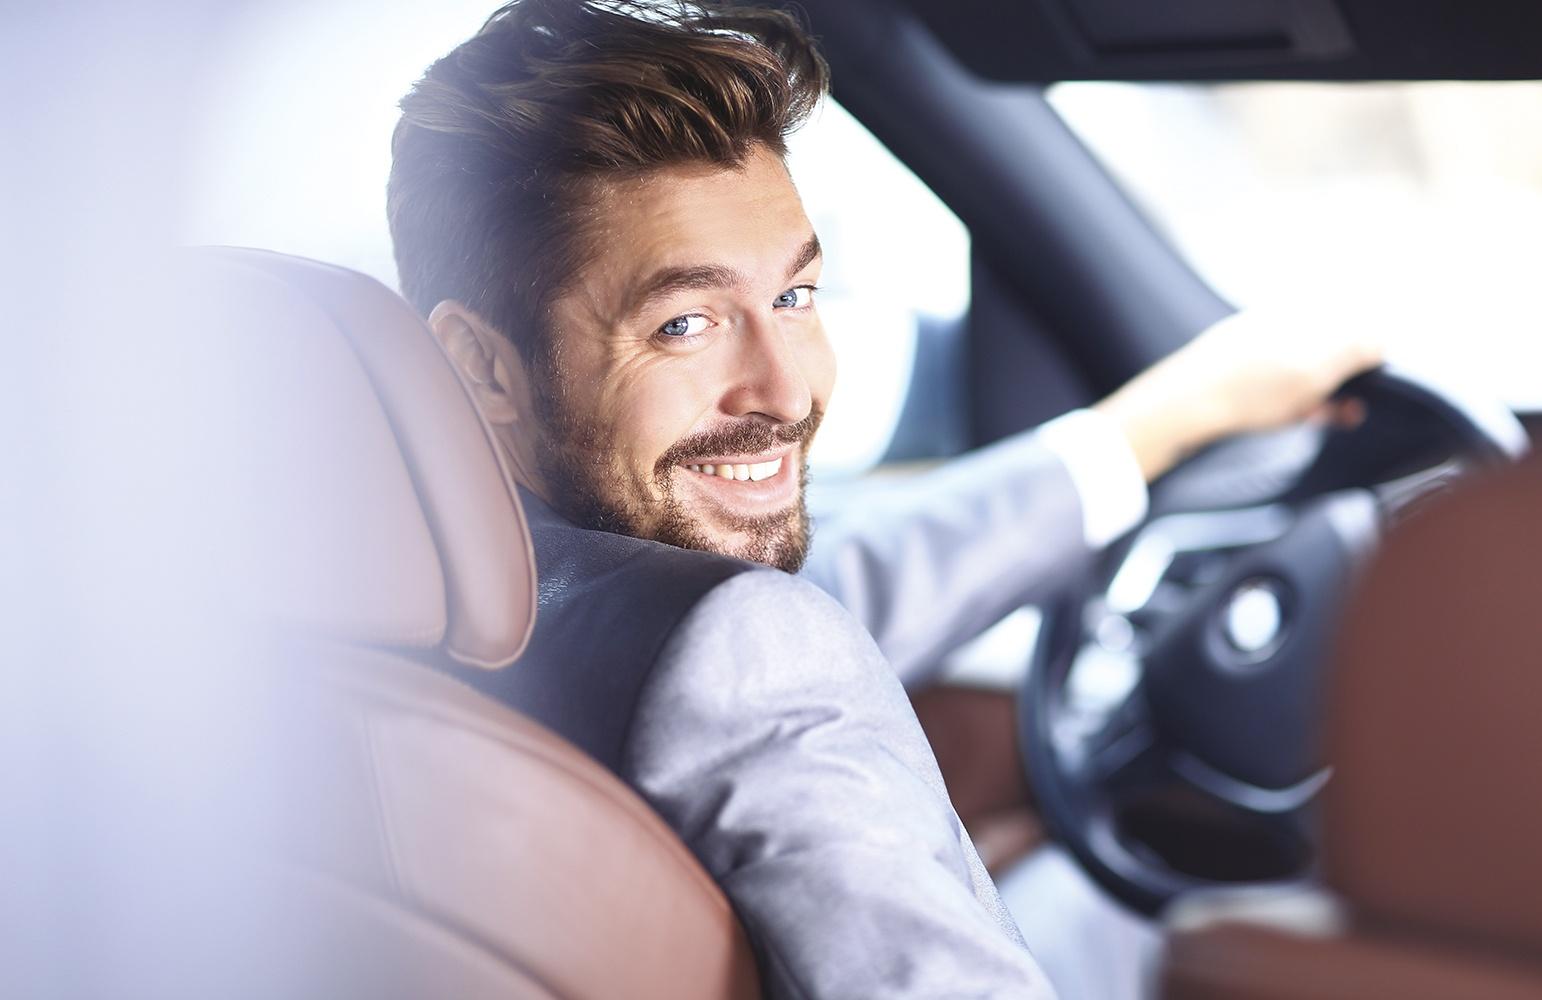 Digital car insurance